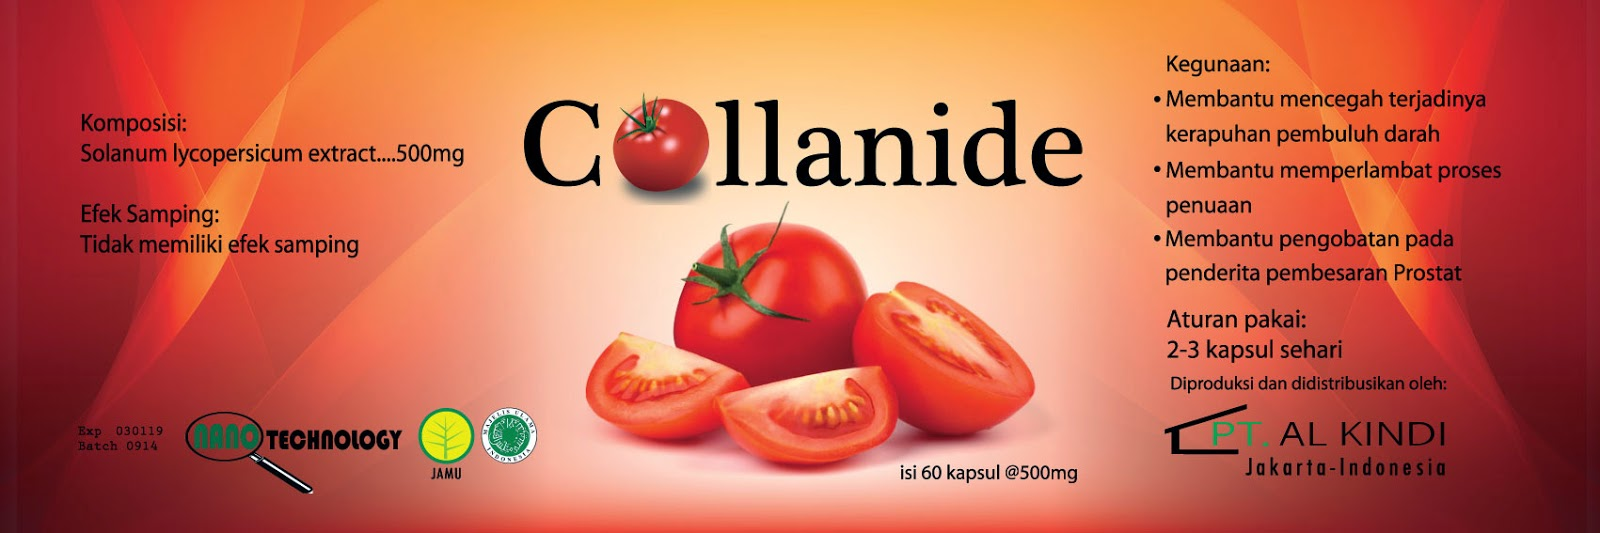 Collanide Solusi Canggih Gangguan Prostat Mengatasi Fruit 18 Jr Isi 60 Kapsul Extracts Minggu 10 Mei 2015